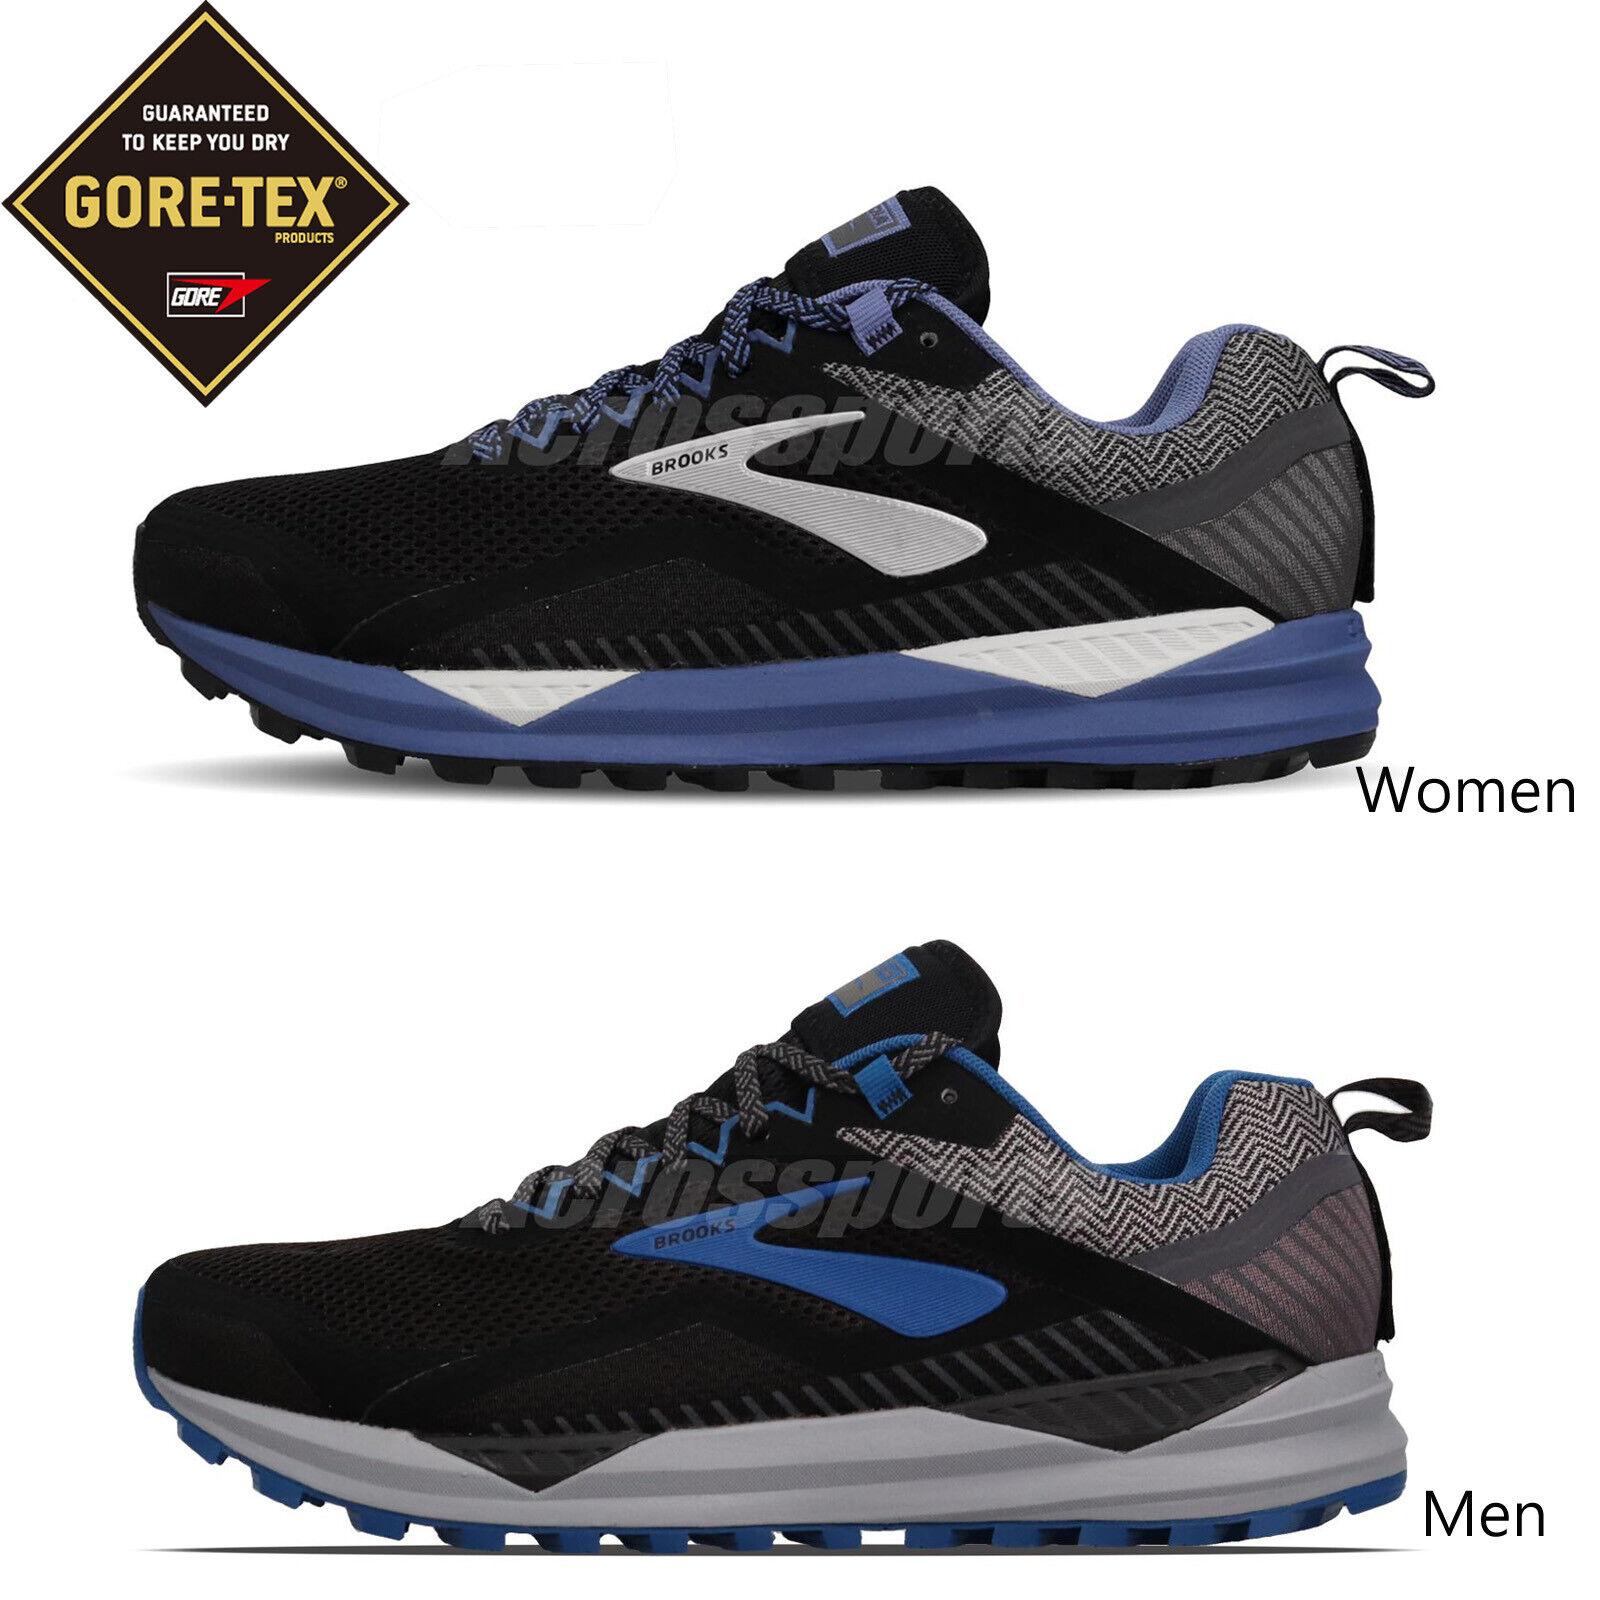 Brooks Cascadia 14 GTX Gore-Tex Men